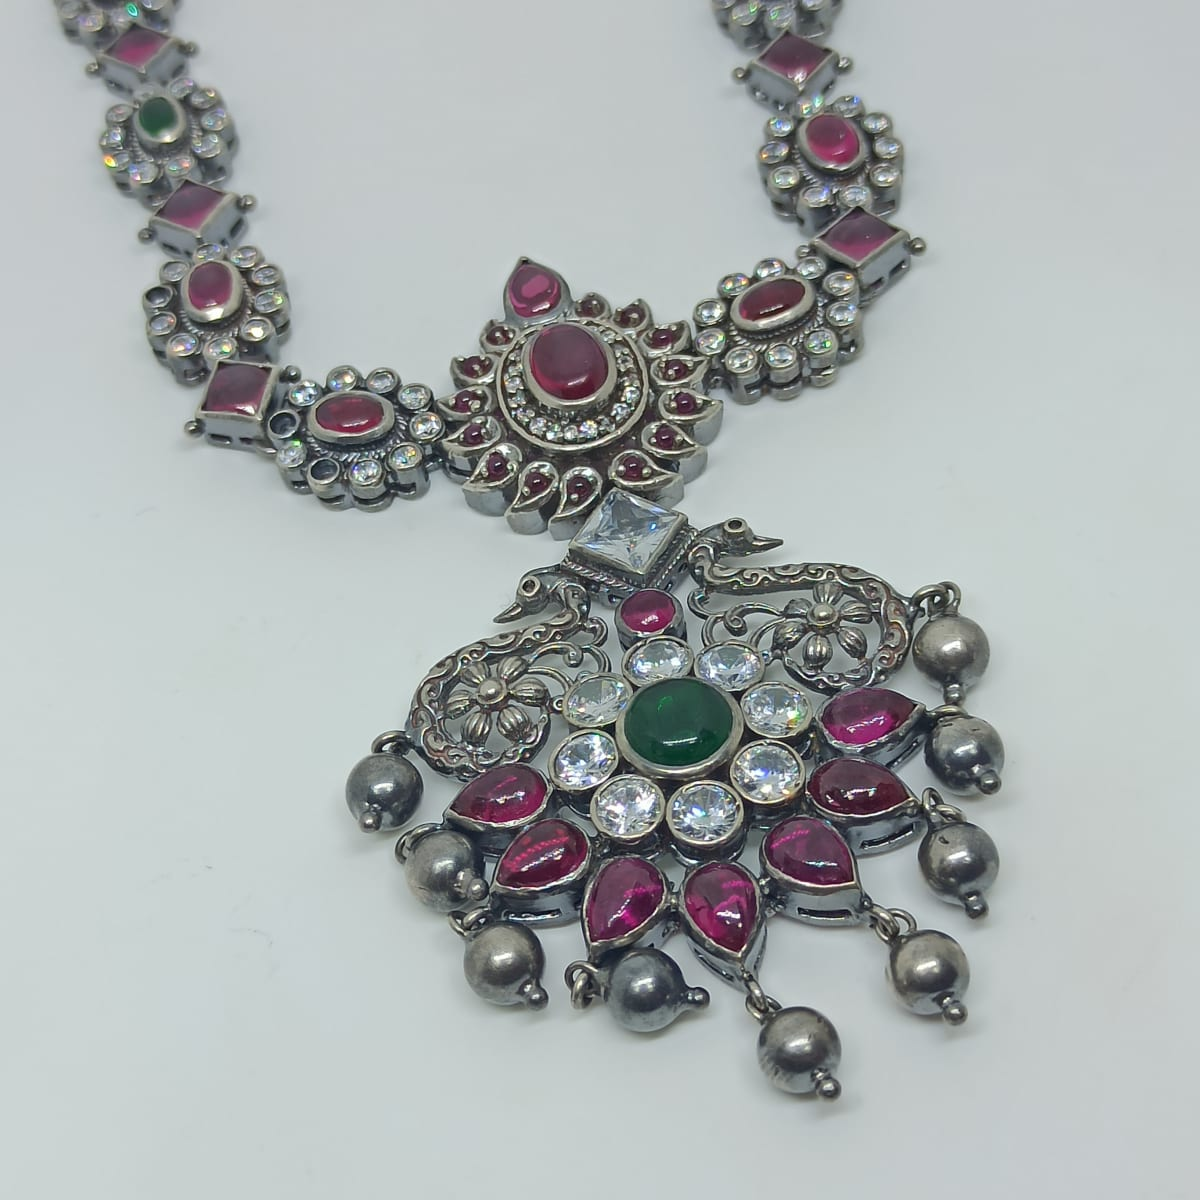 Peacock Antique Stone Necklace